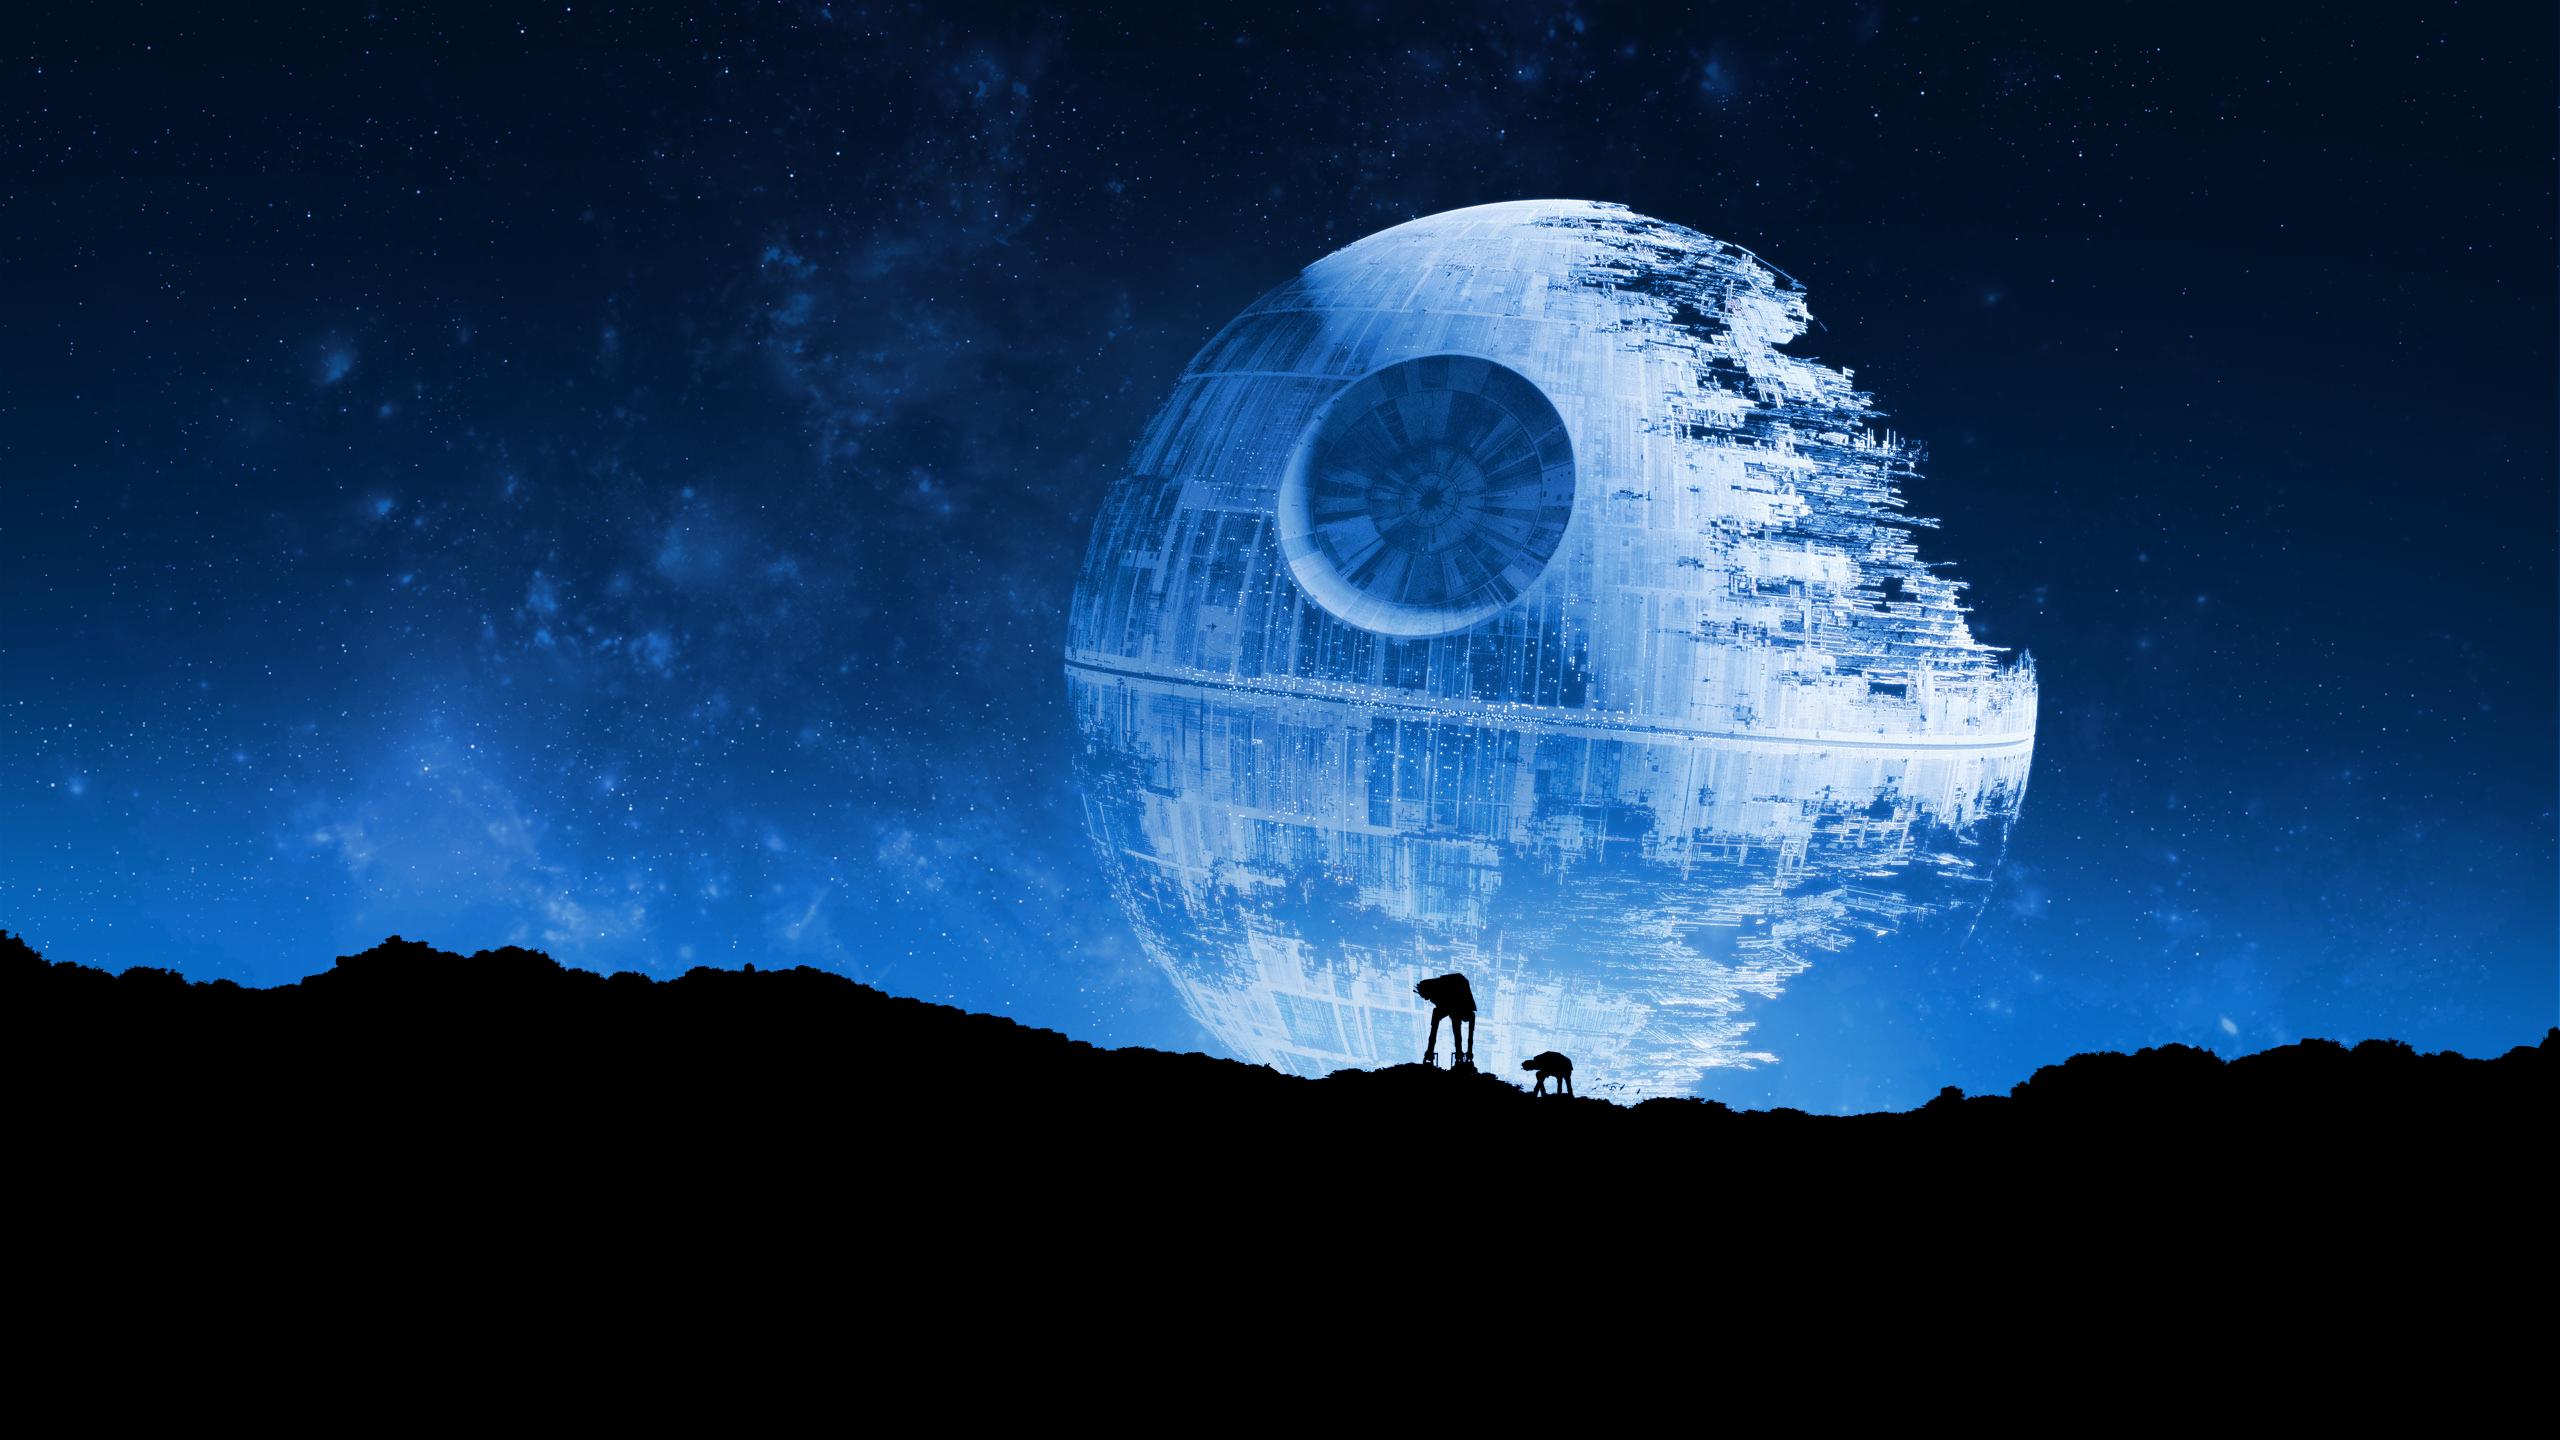 Star Wars - Death Star Wallpaper by RockLou on DeviantArt